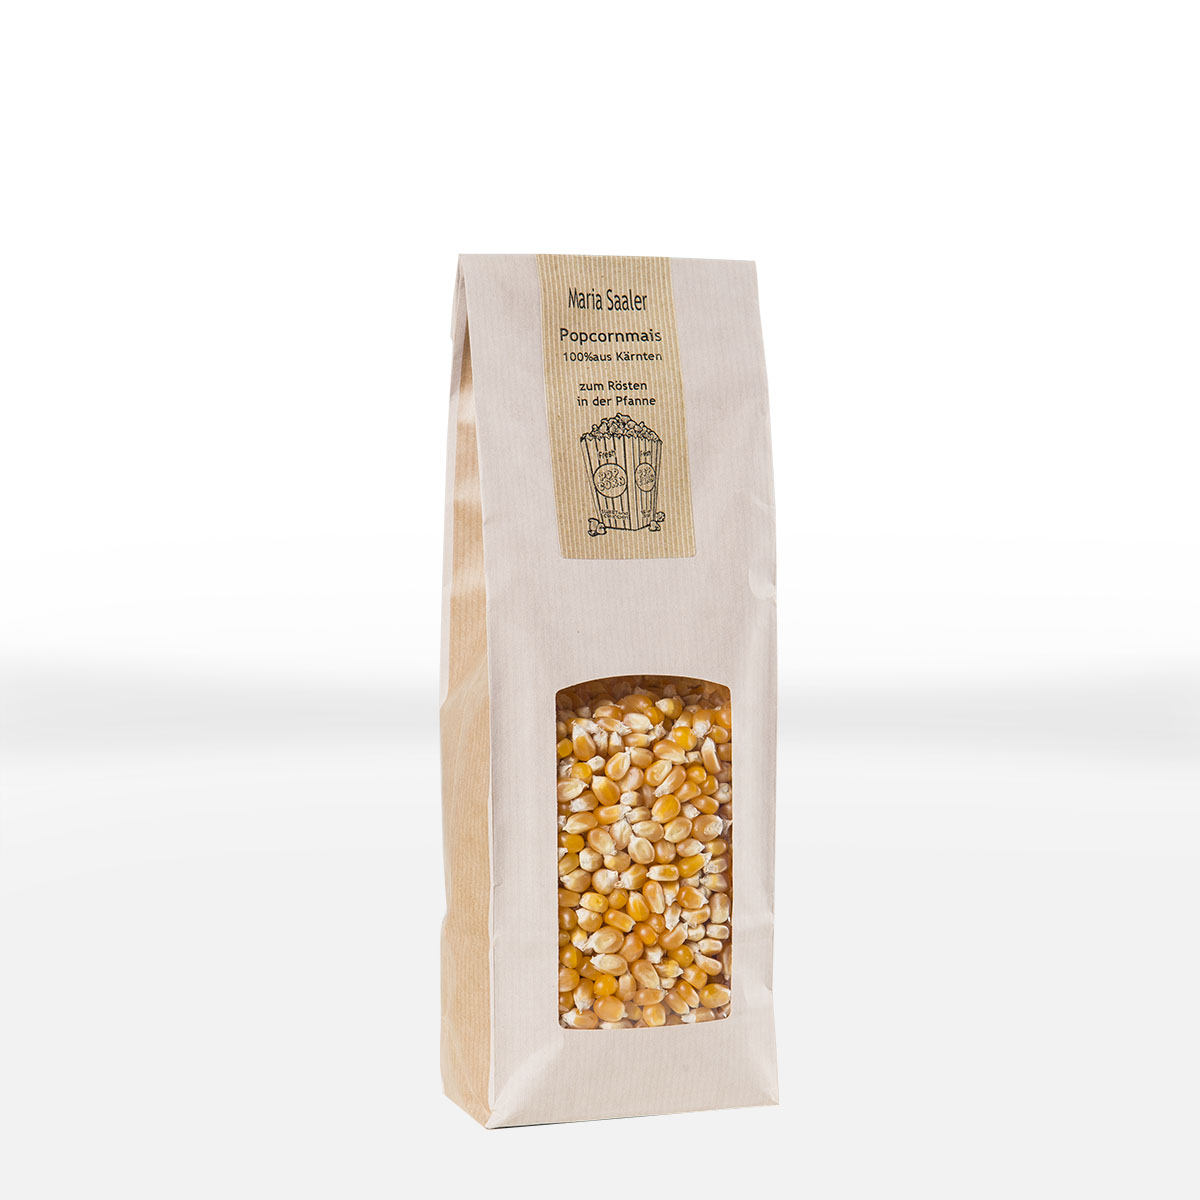 Bauernhof Knafl - Popcornmais 500g